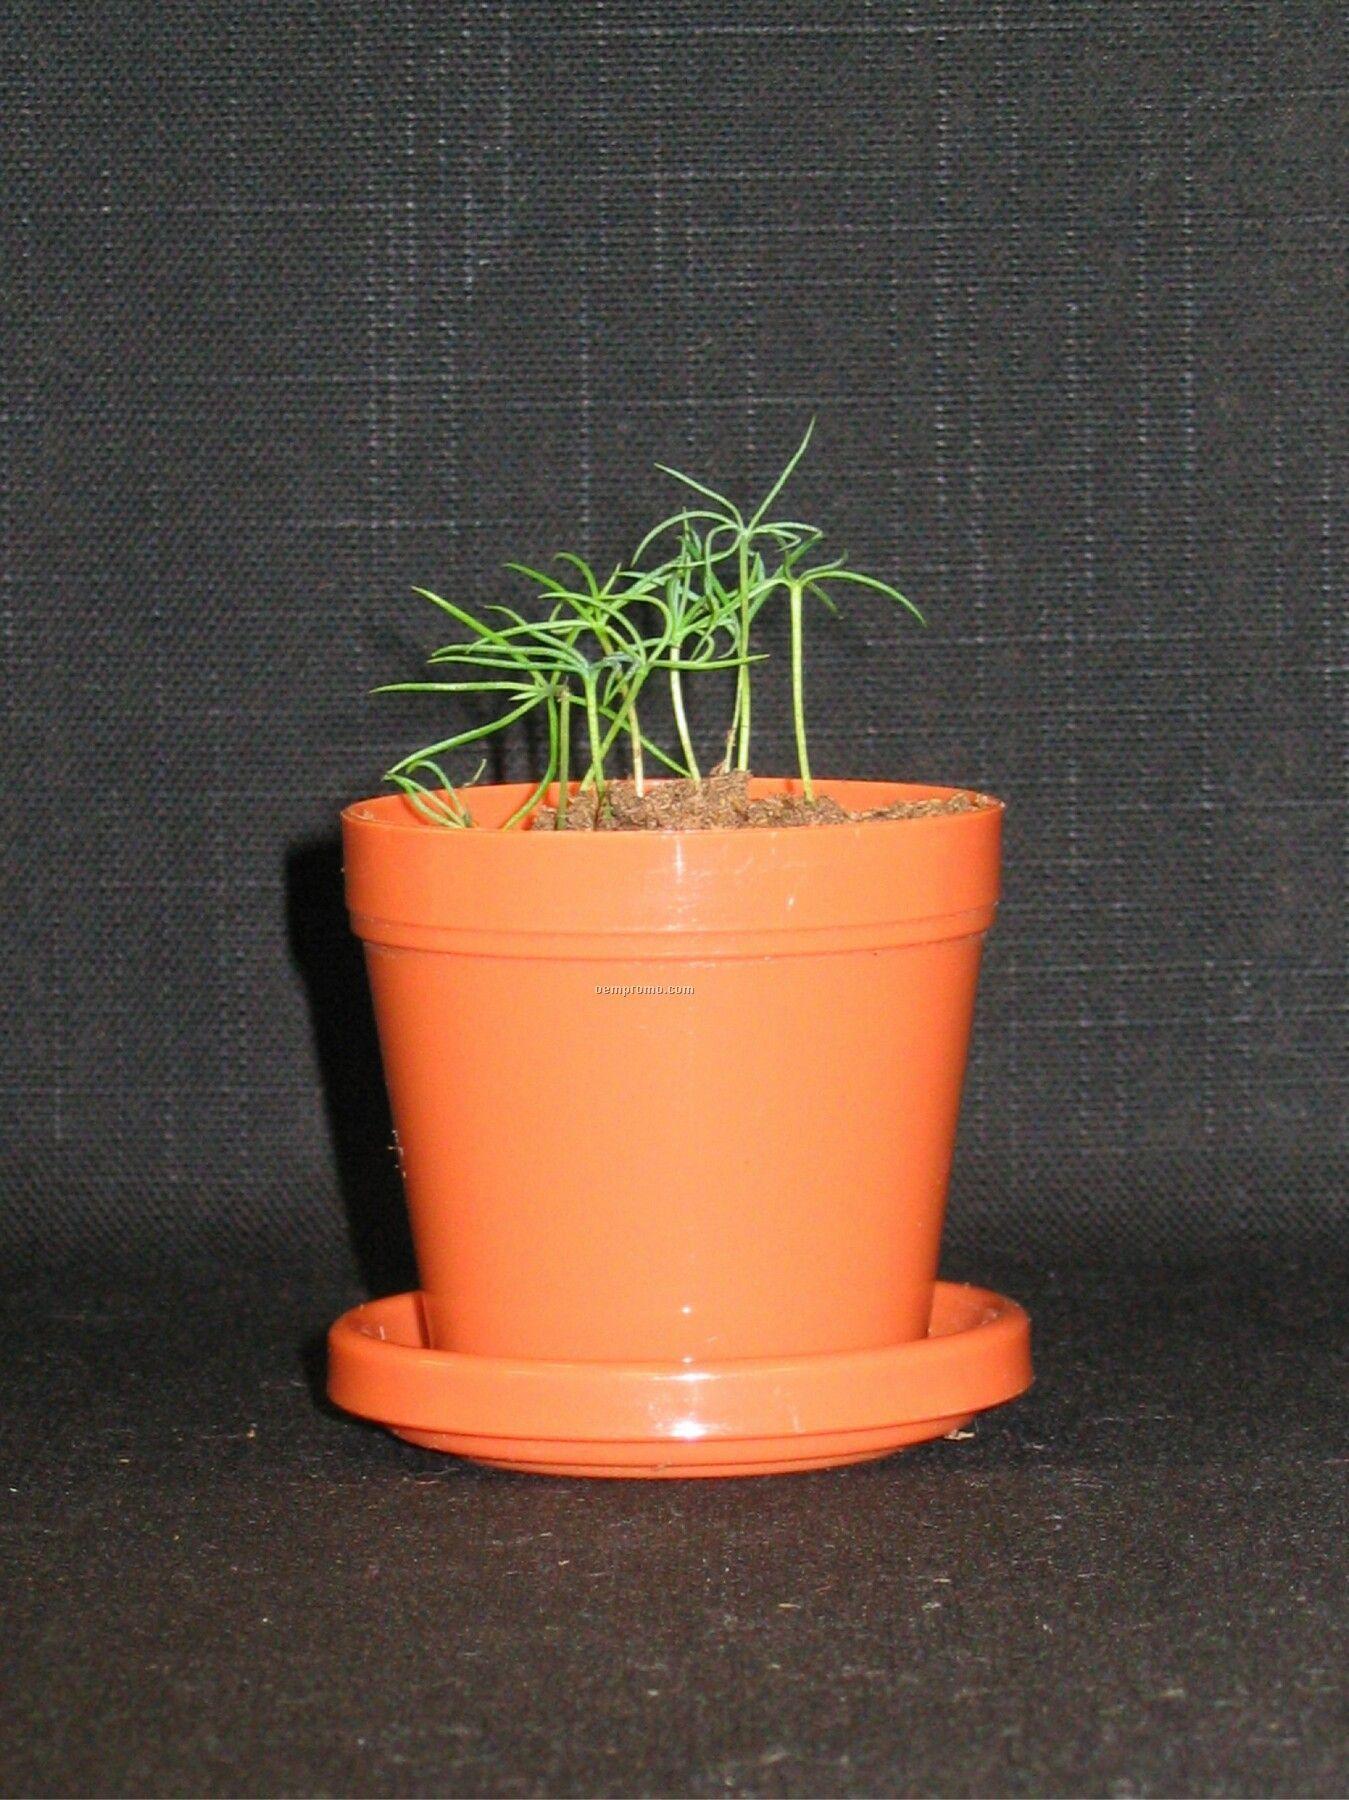 Colorado Blue Spruce Mini Logo Planter Kit (No Imprint)